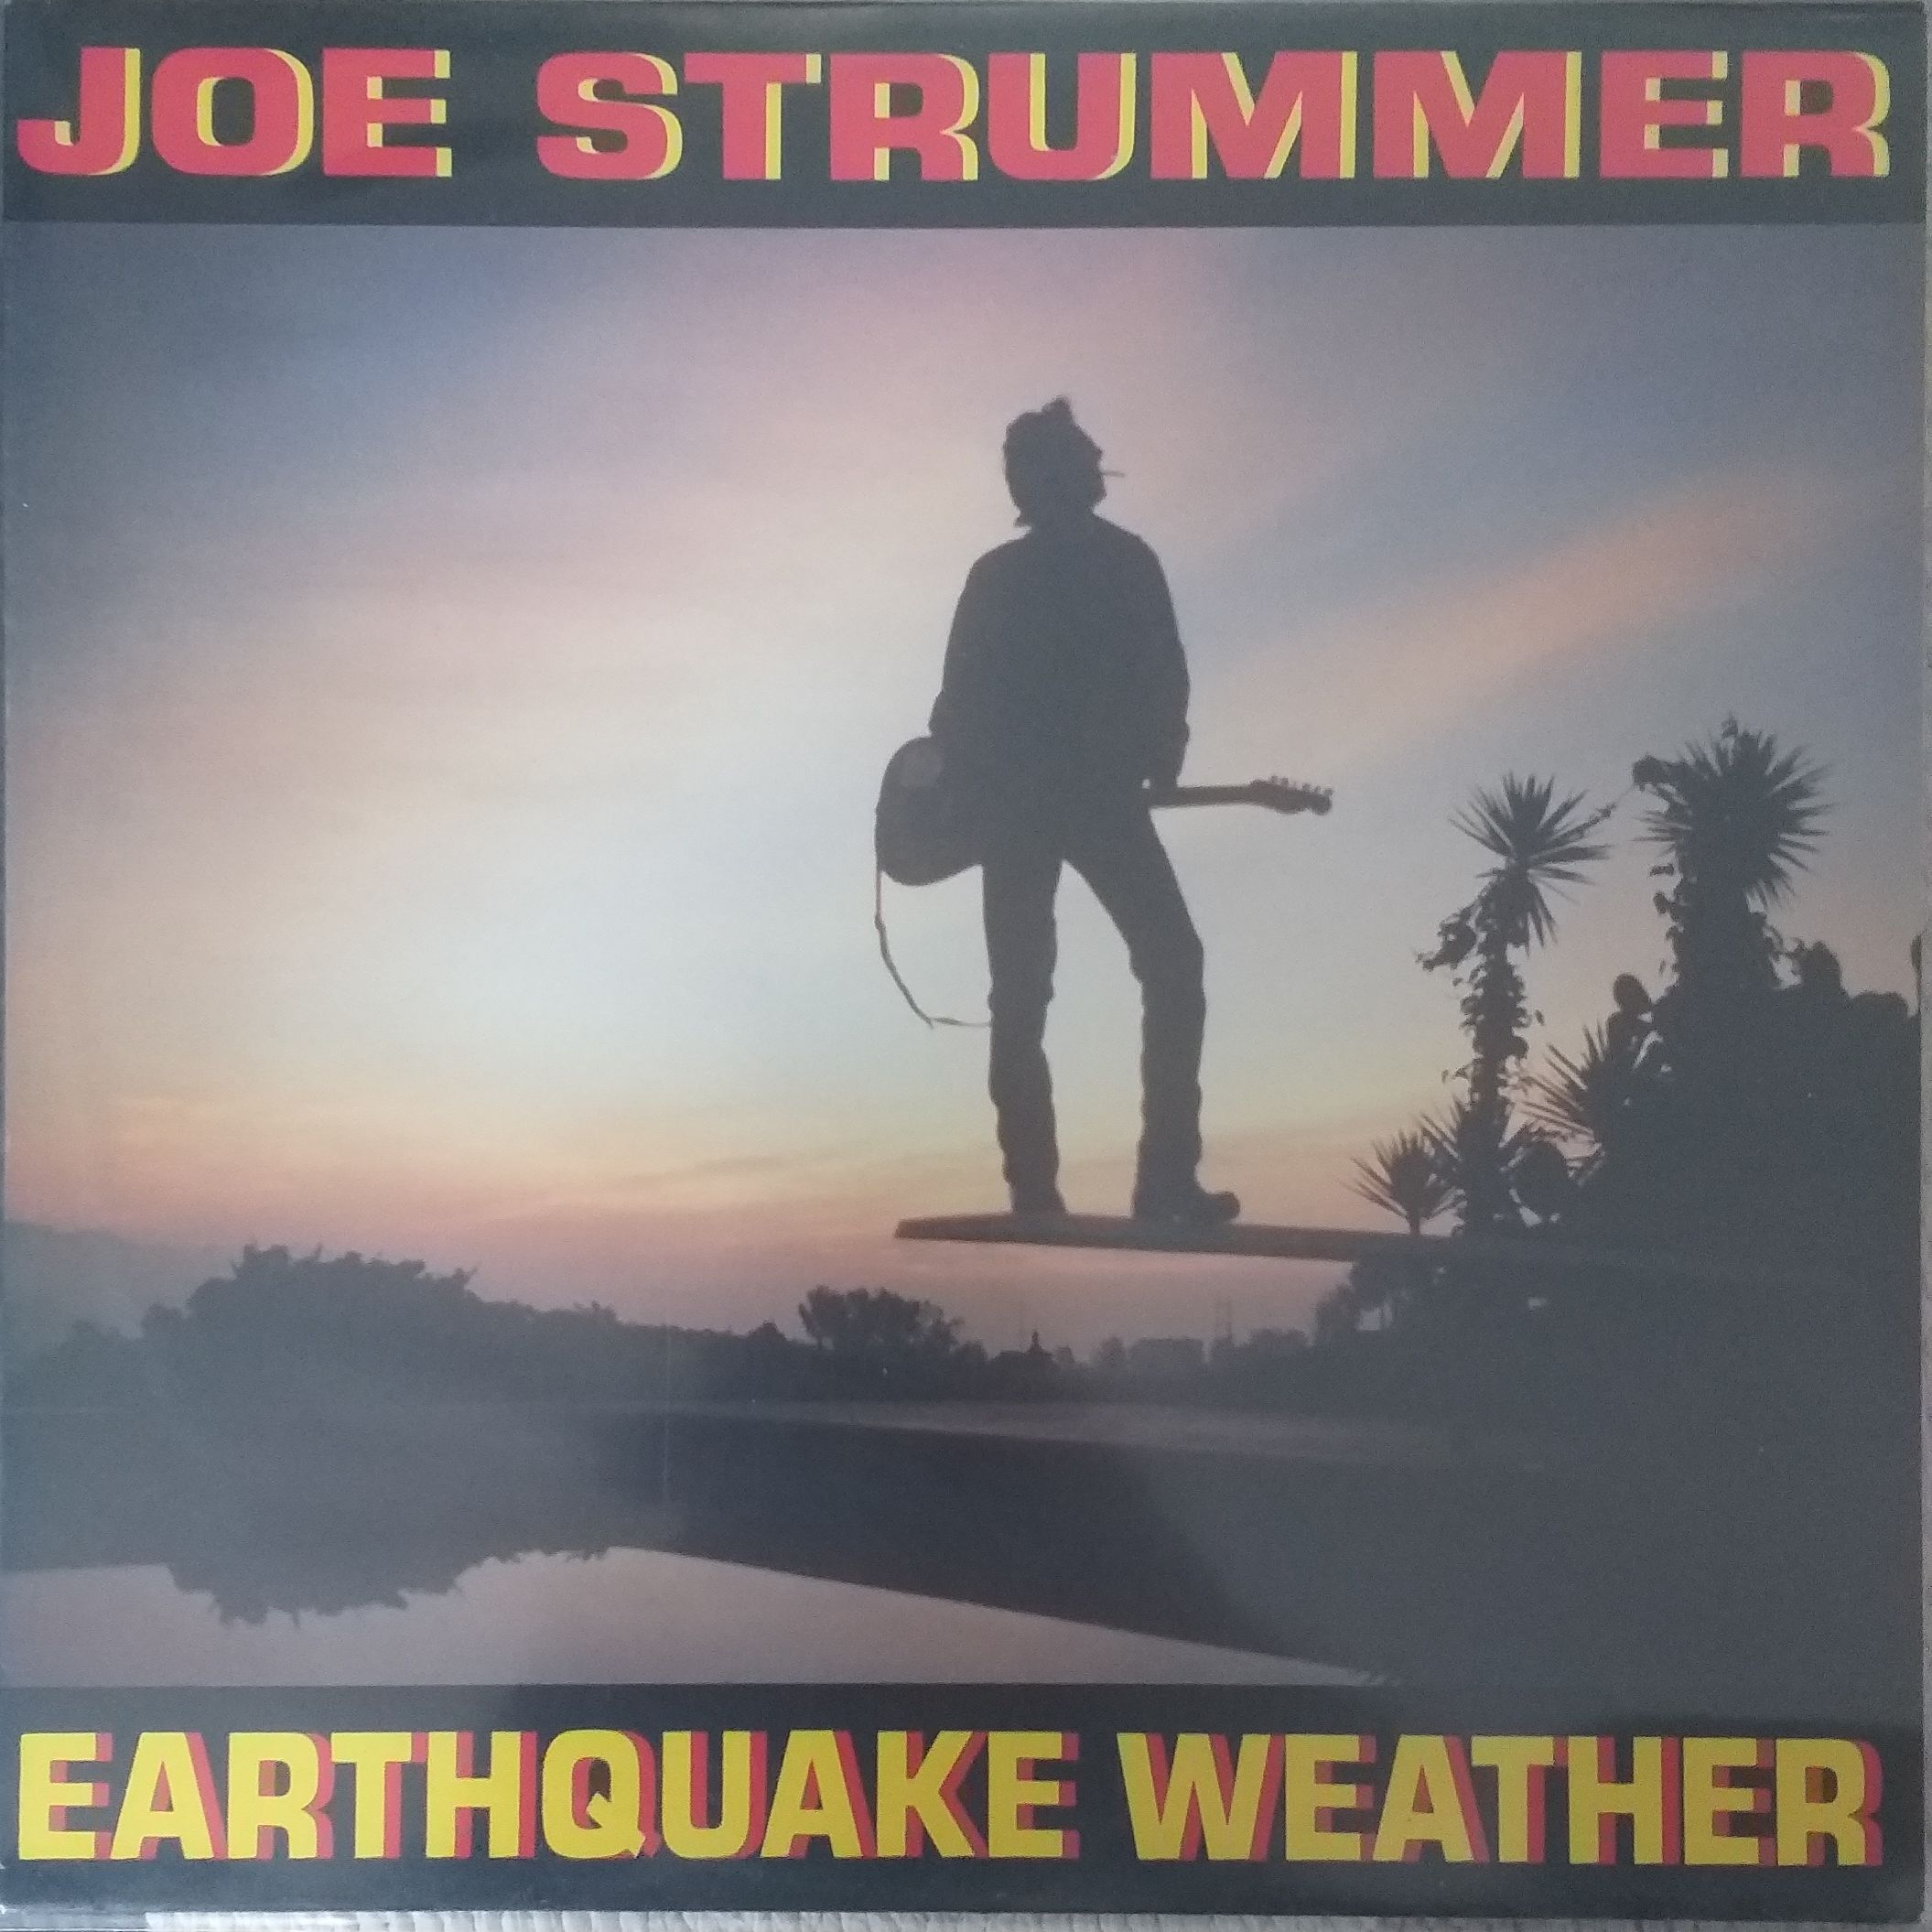 Joe Strummer Earthquake weather LP undefined